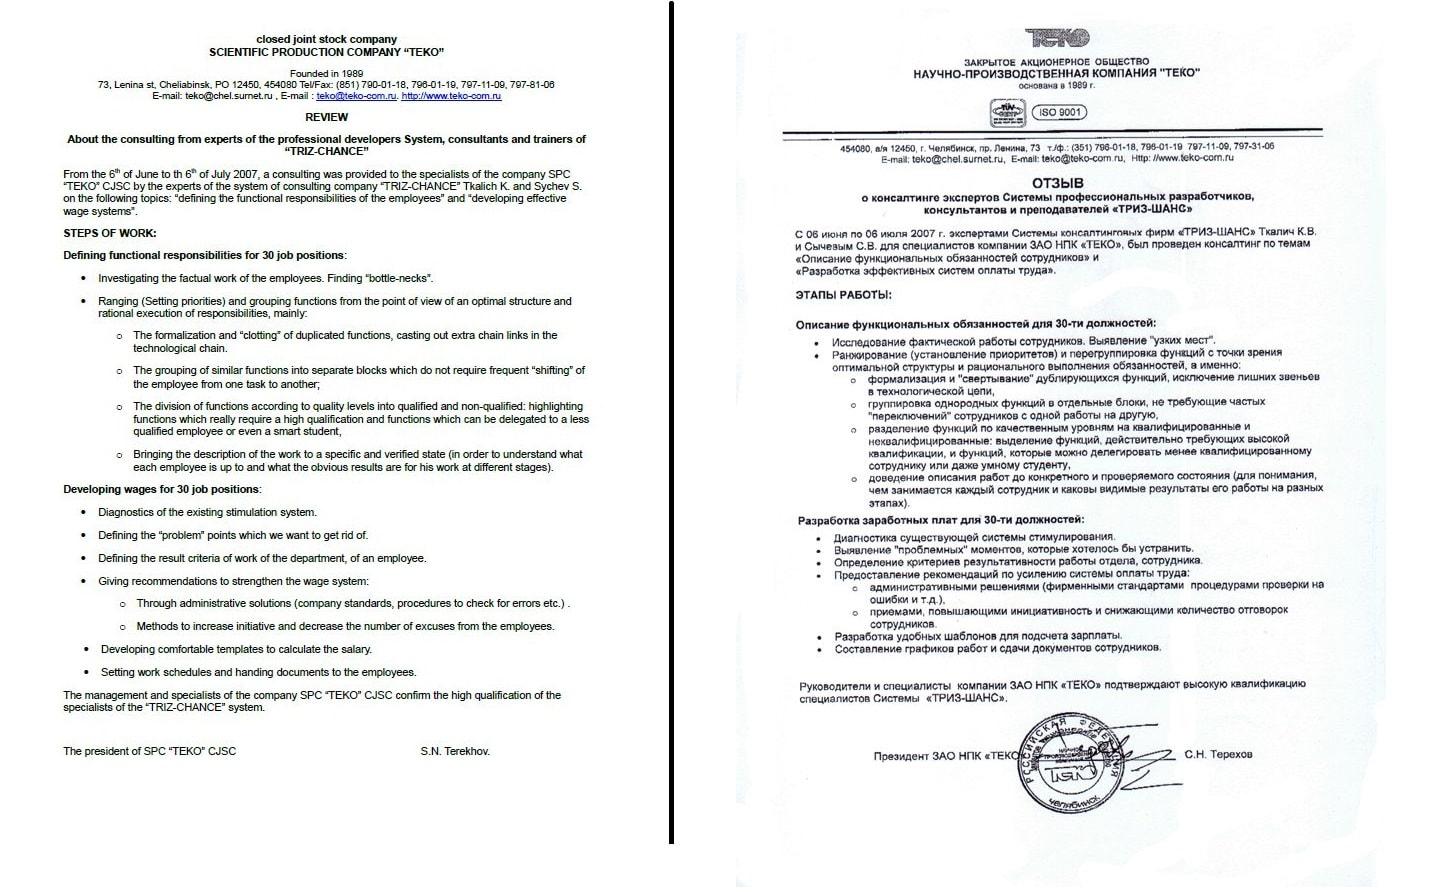 Elaboration of smart salaries - Business website TRIZ-RI